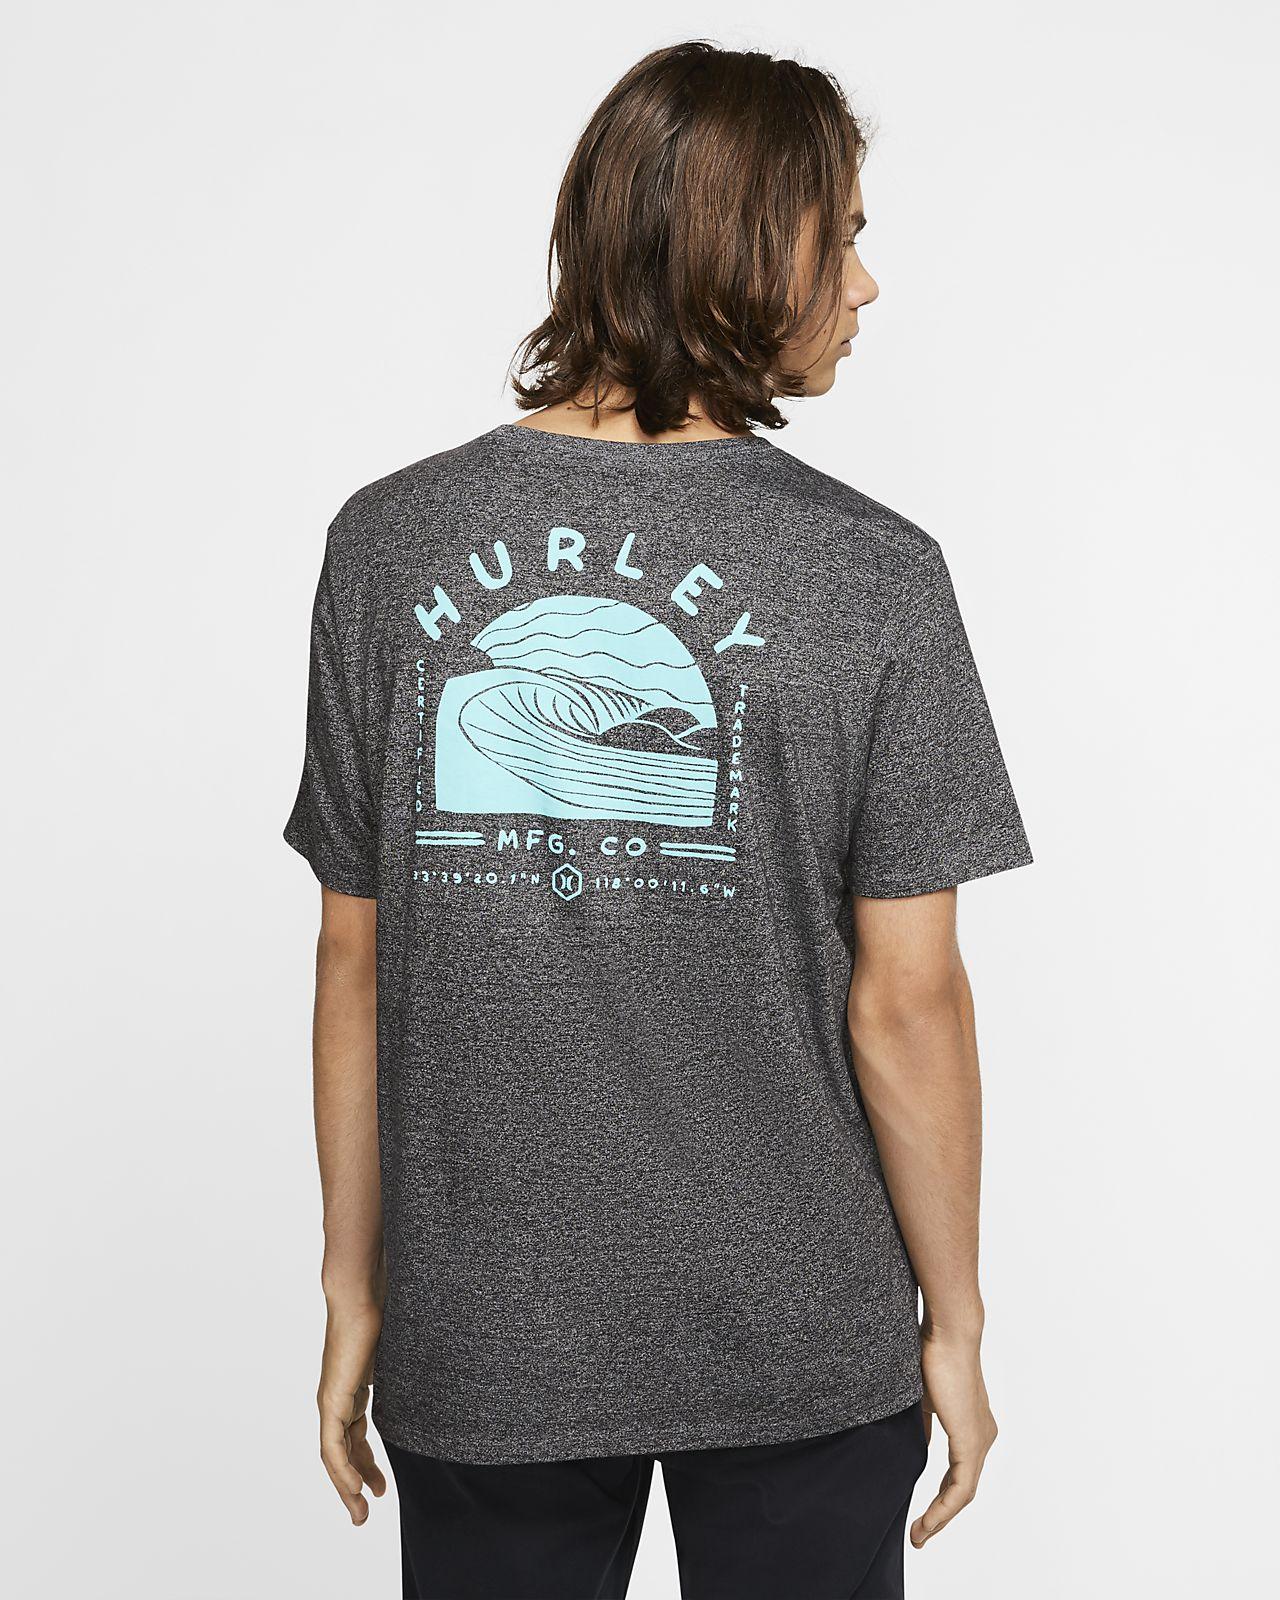 HURLEY  SIRO DAYBREAK T-SHIRT- BLACK HTR